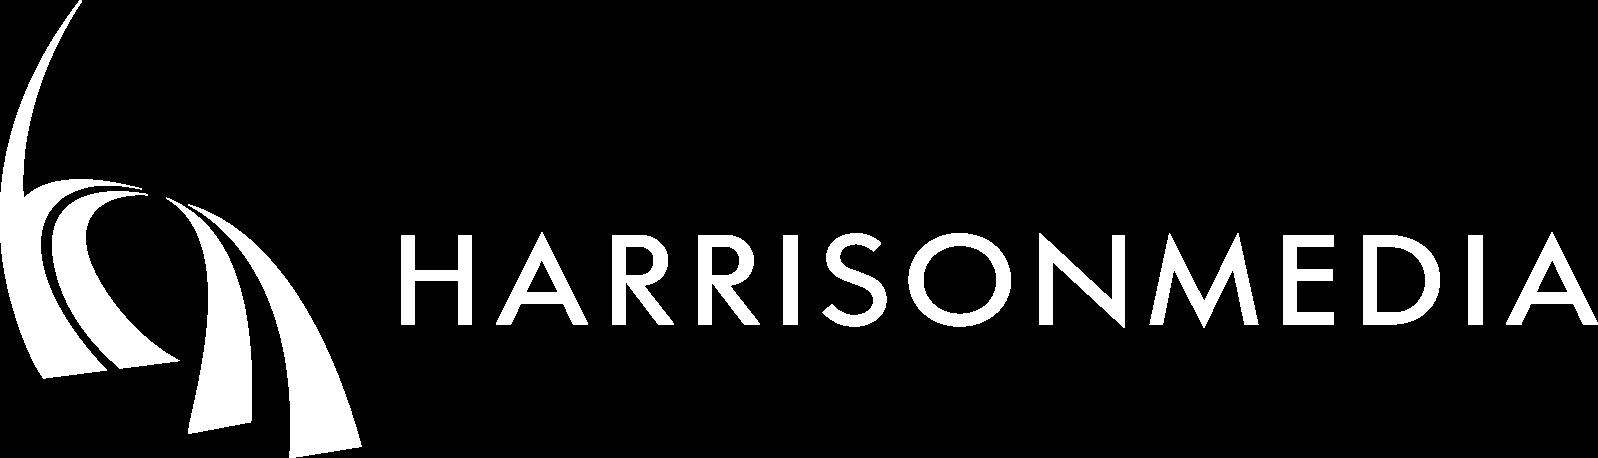 Harrison Media